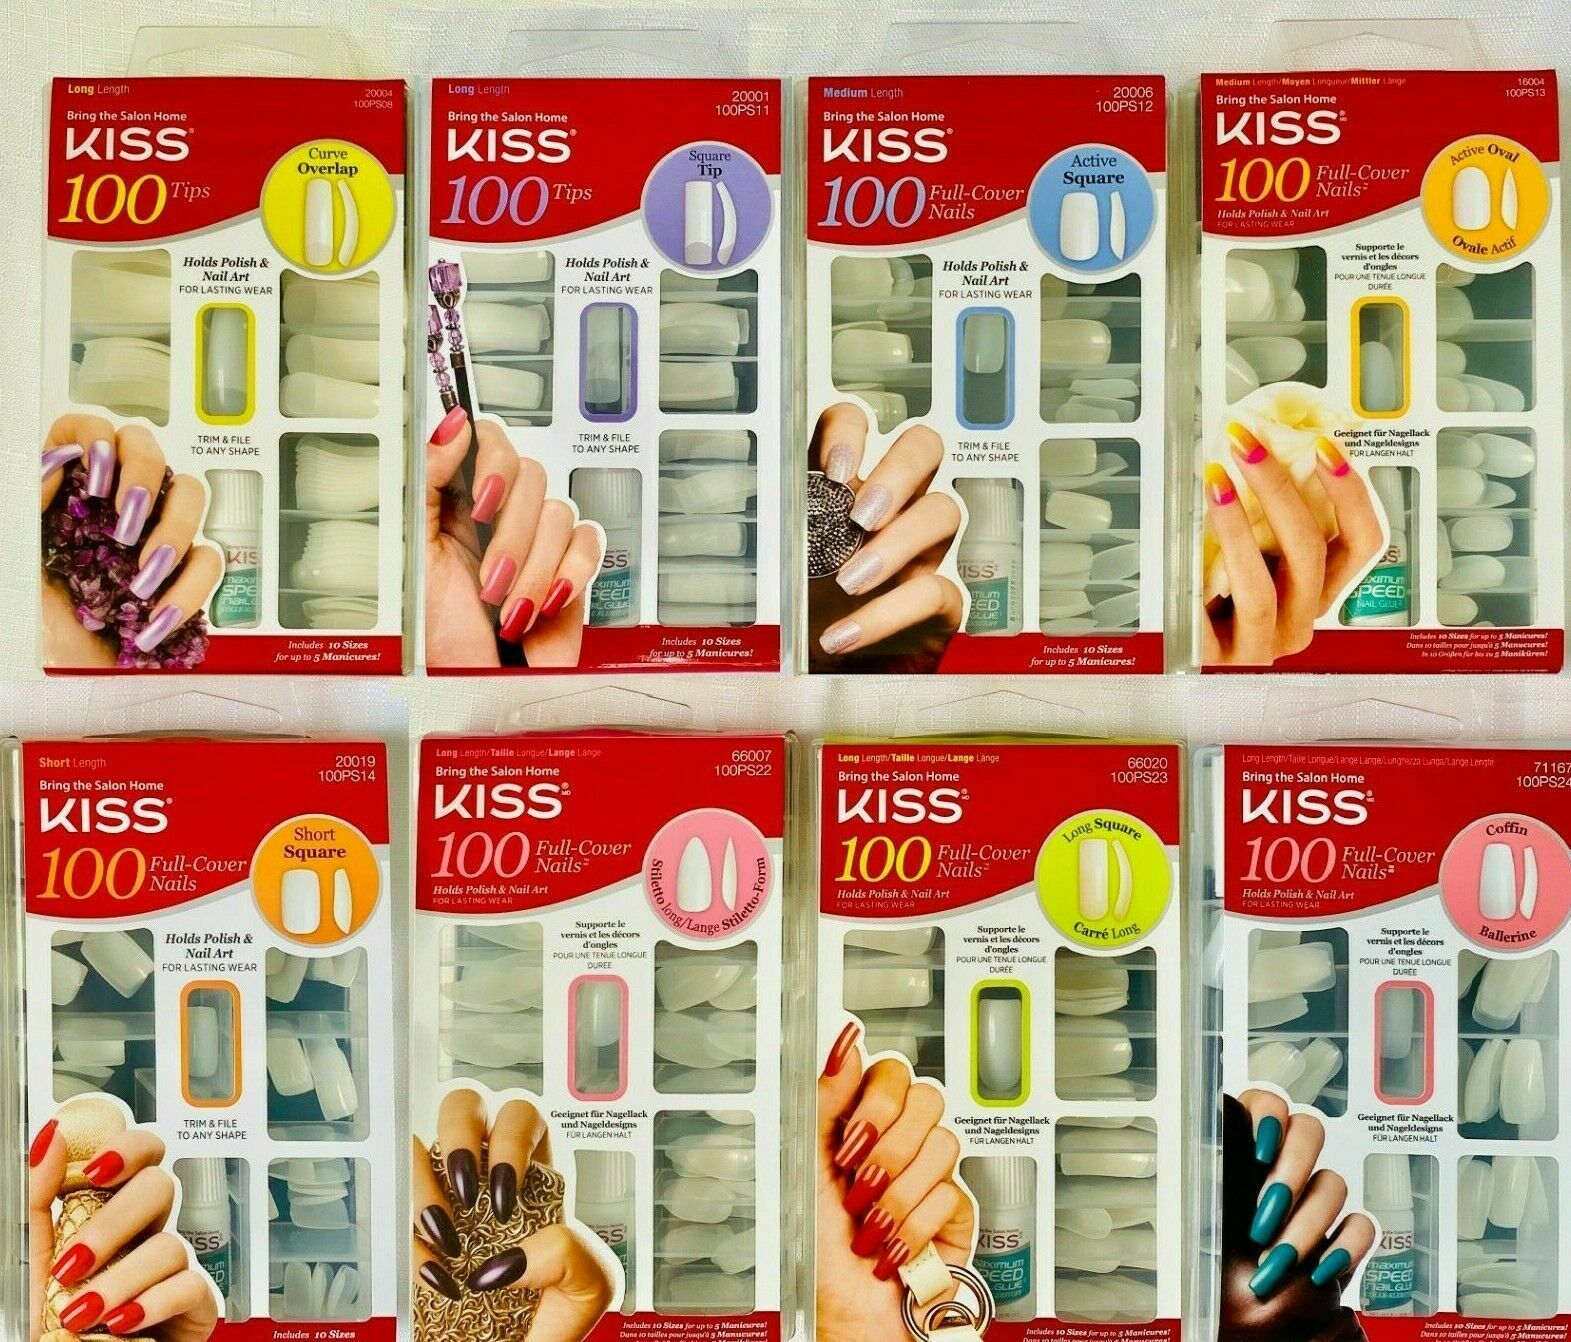 Kiss Salon 100 Full Cover Nail Glue Manicure Kit Overlap Square Oval Coffin NEW - $9.99